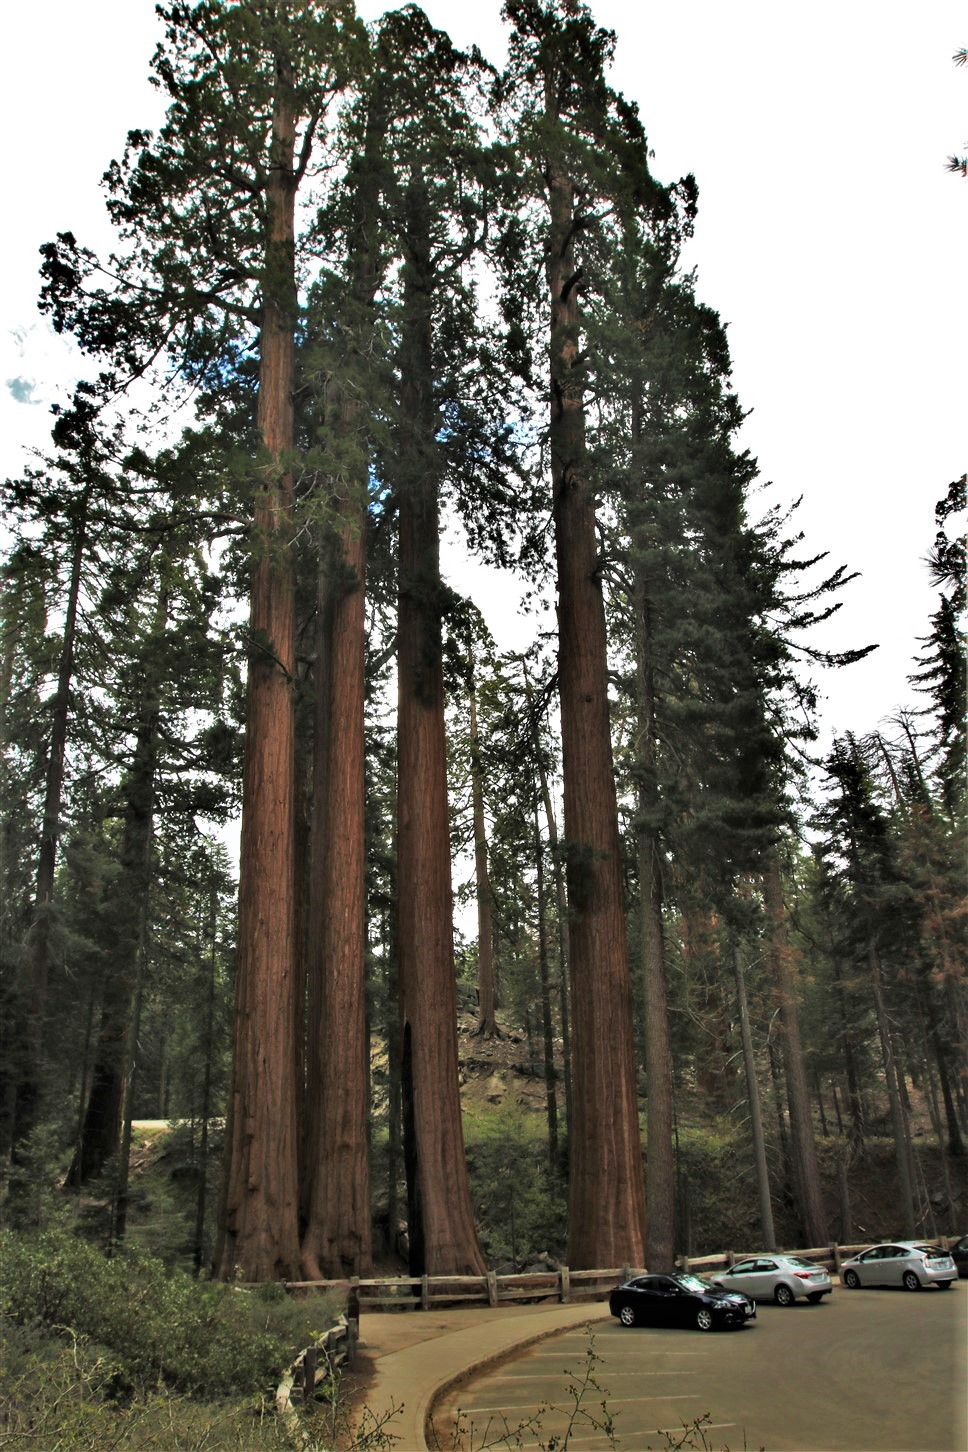 2016 05 23 41 Sequoia Kings Canyon.jpg